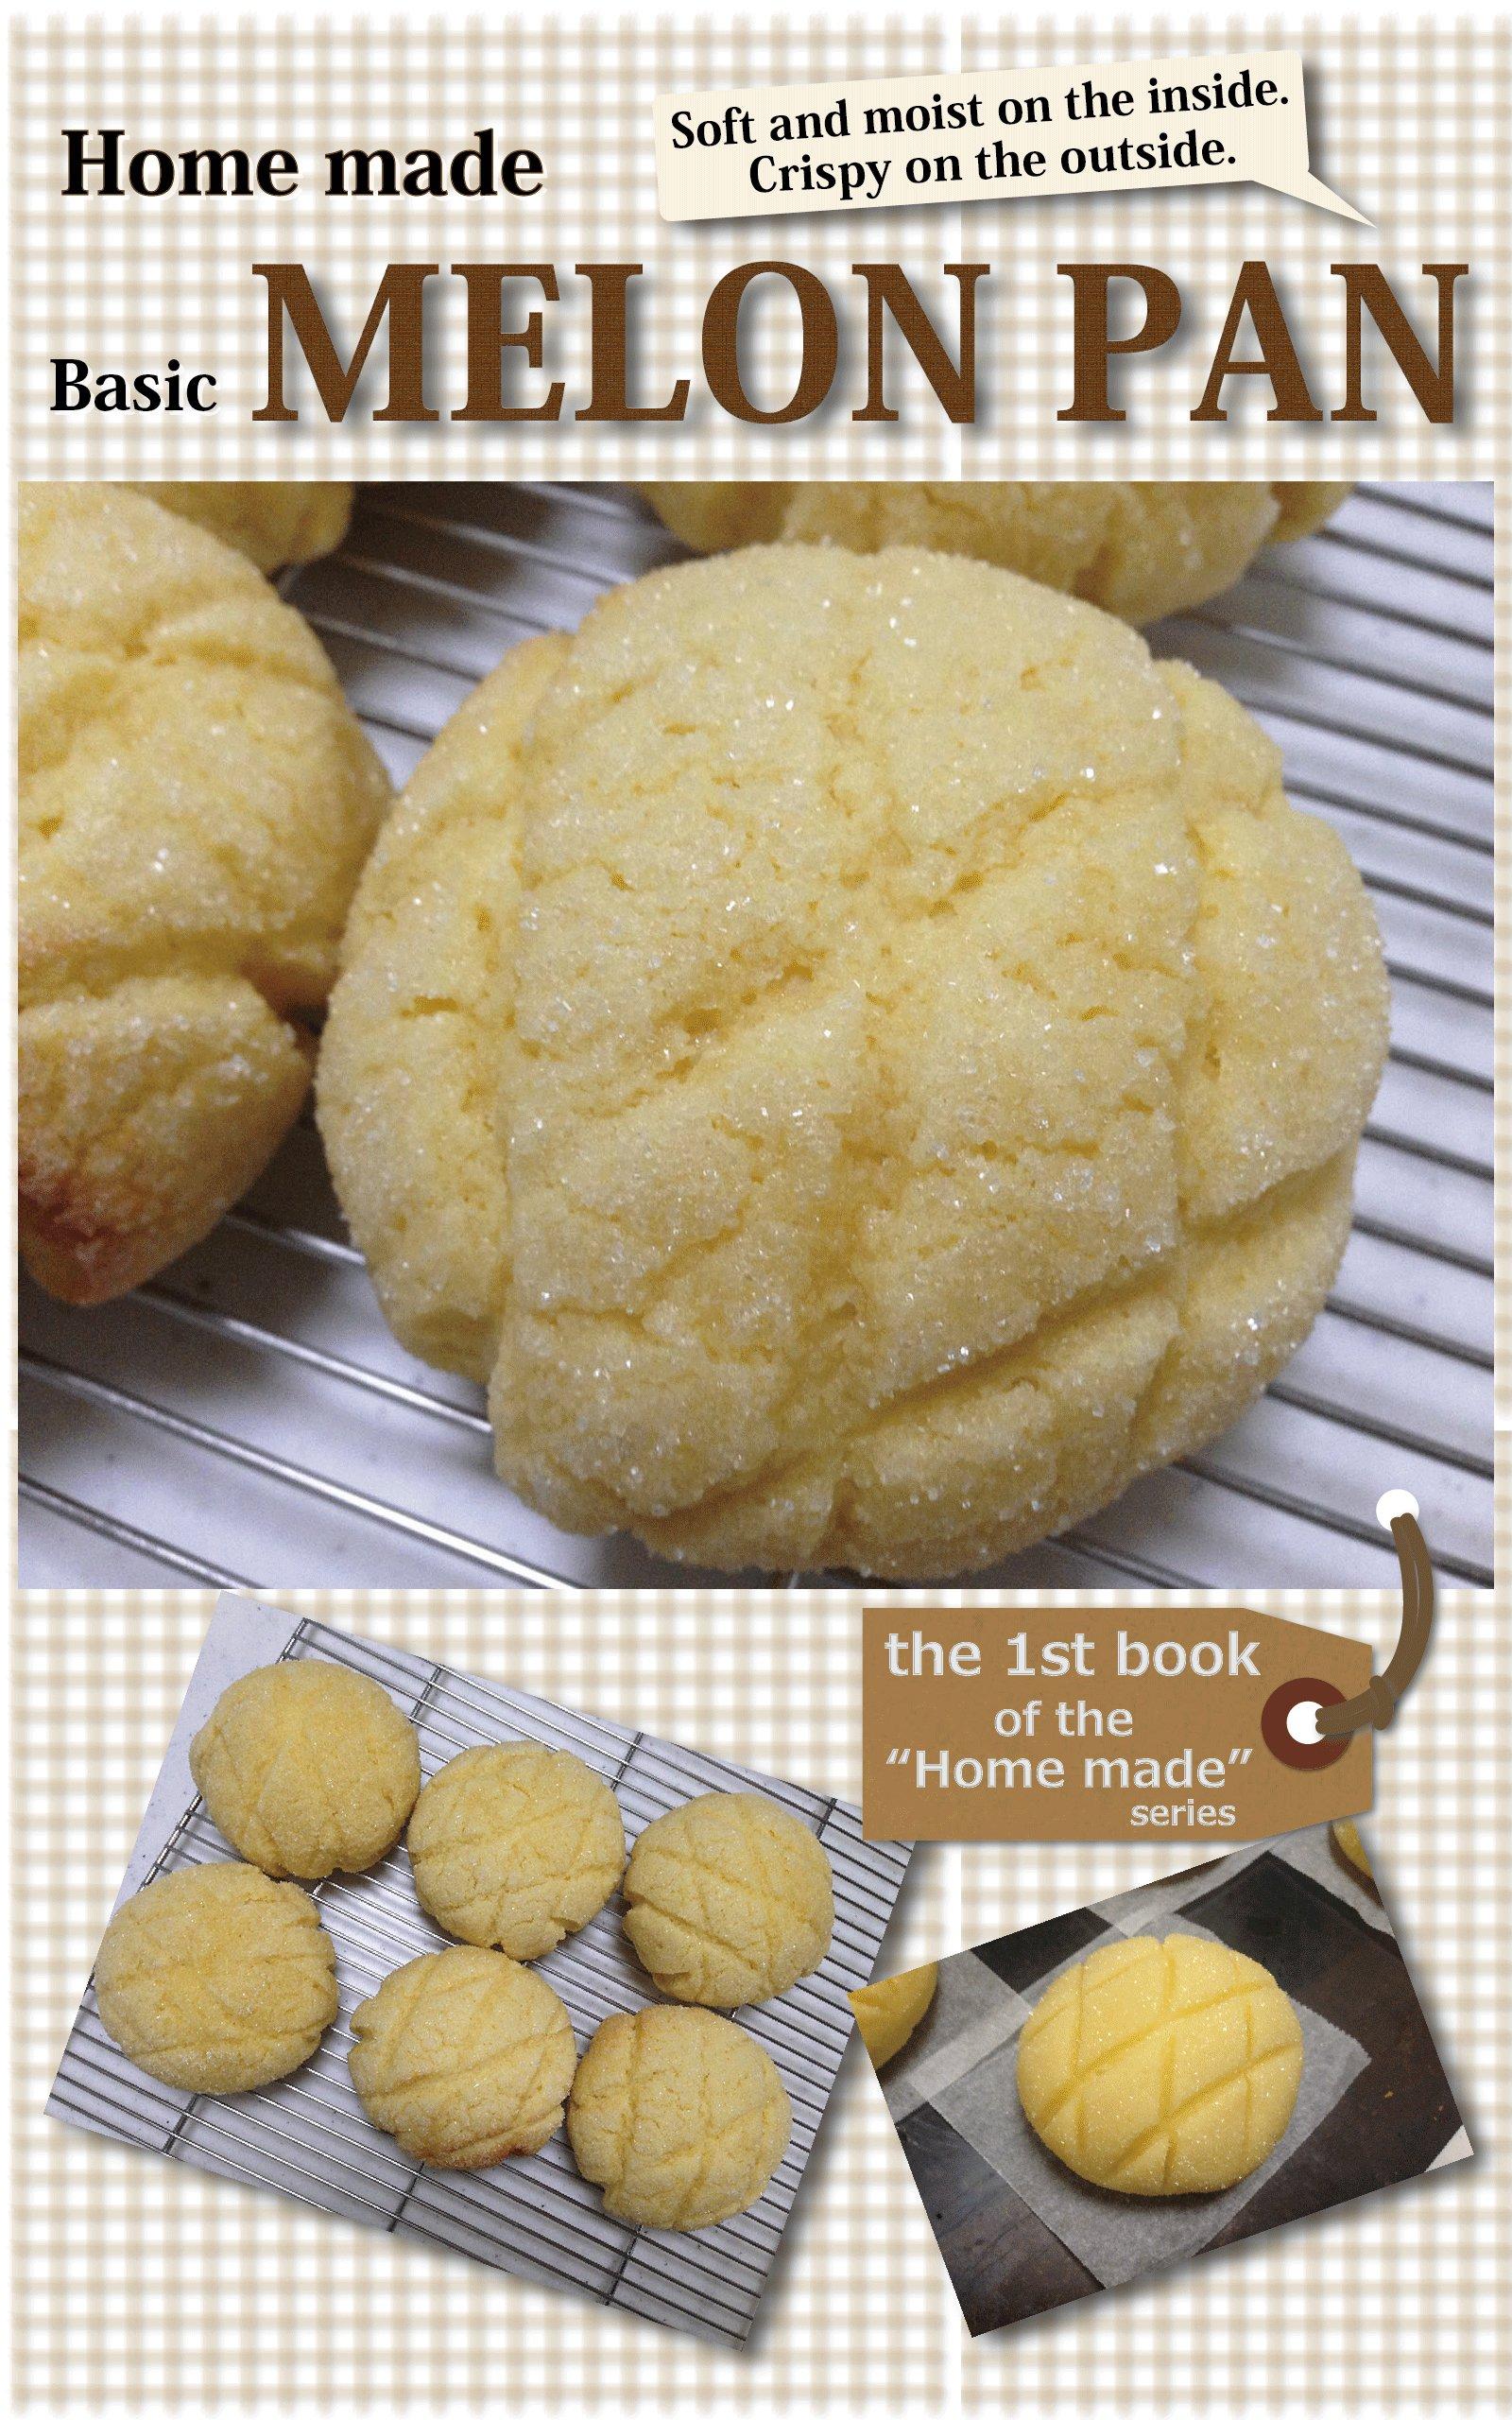 Home Made MELON PAN  How To Make Japanese Bread 'MELON PAN'.  English Edition